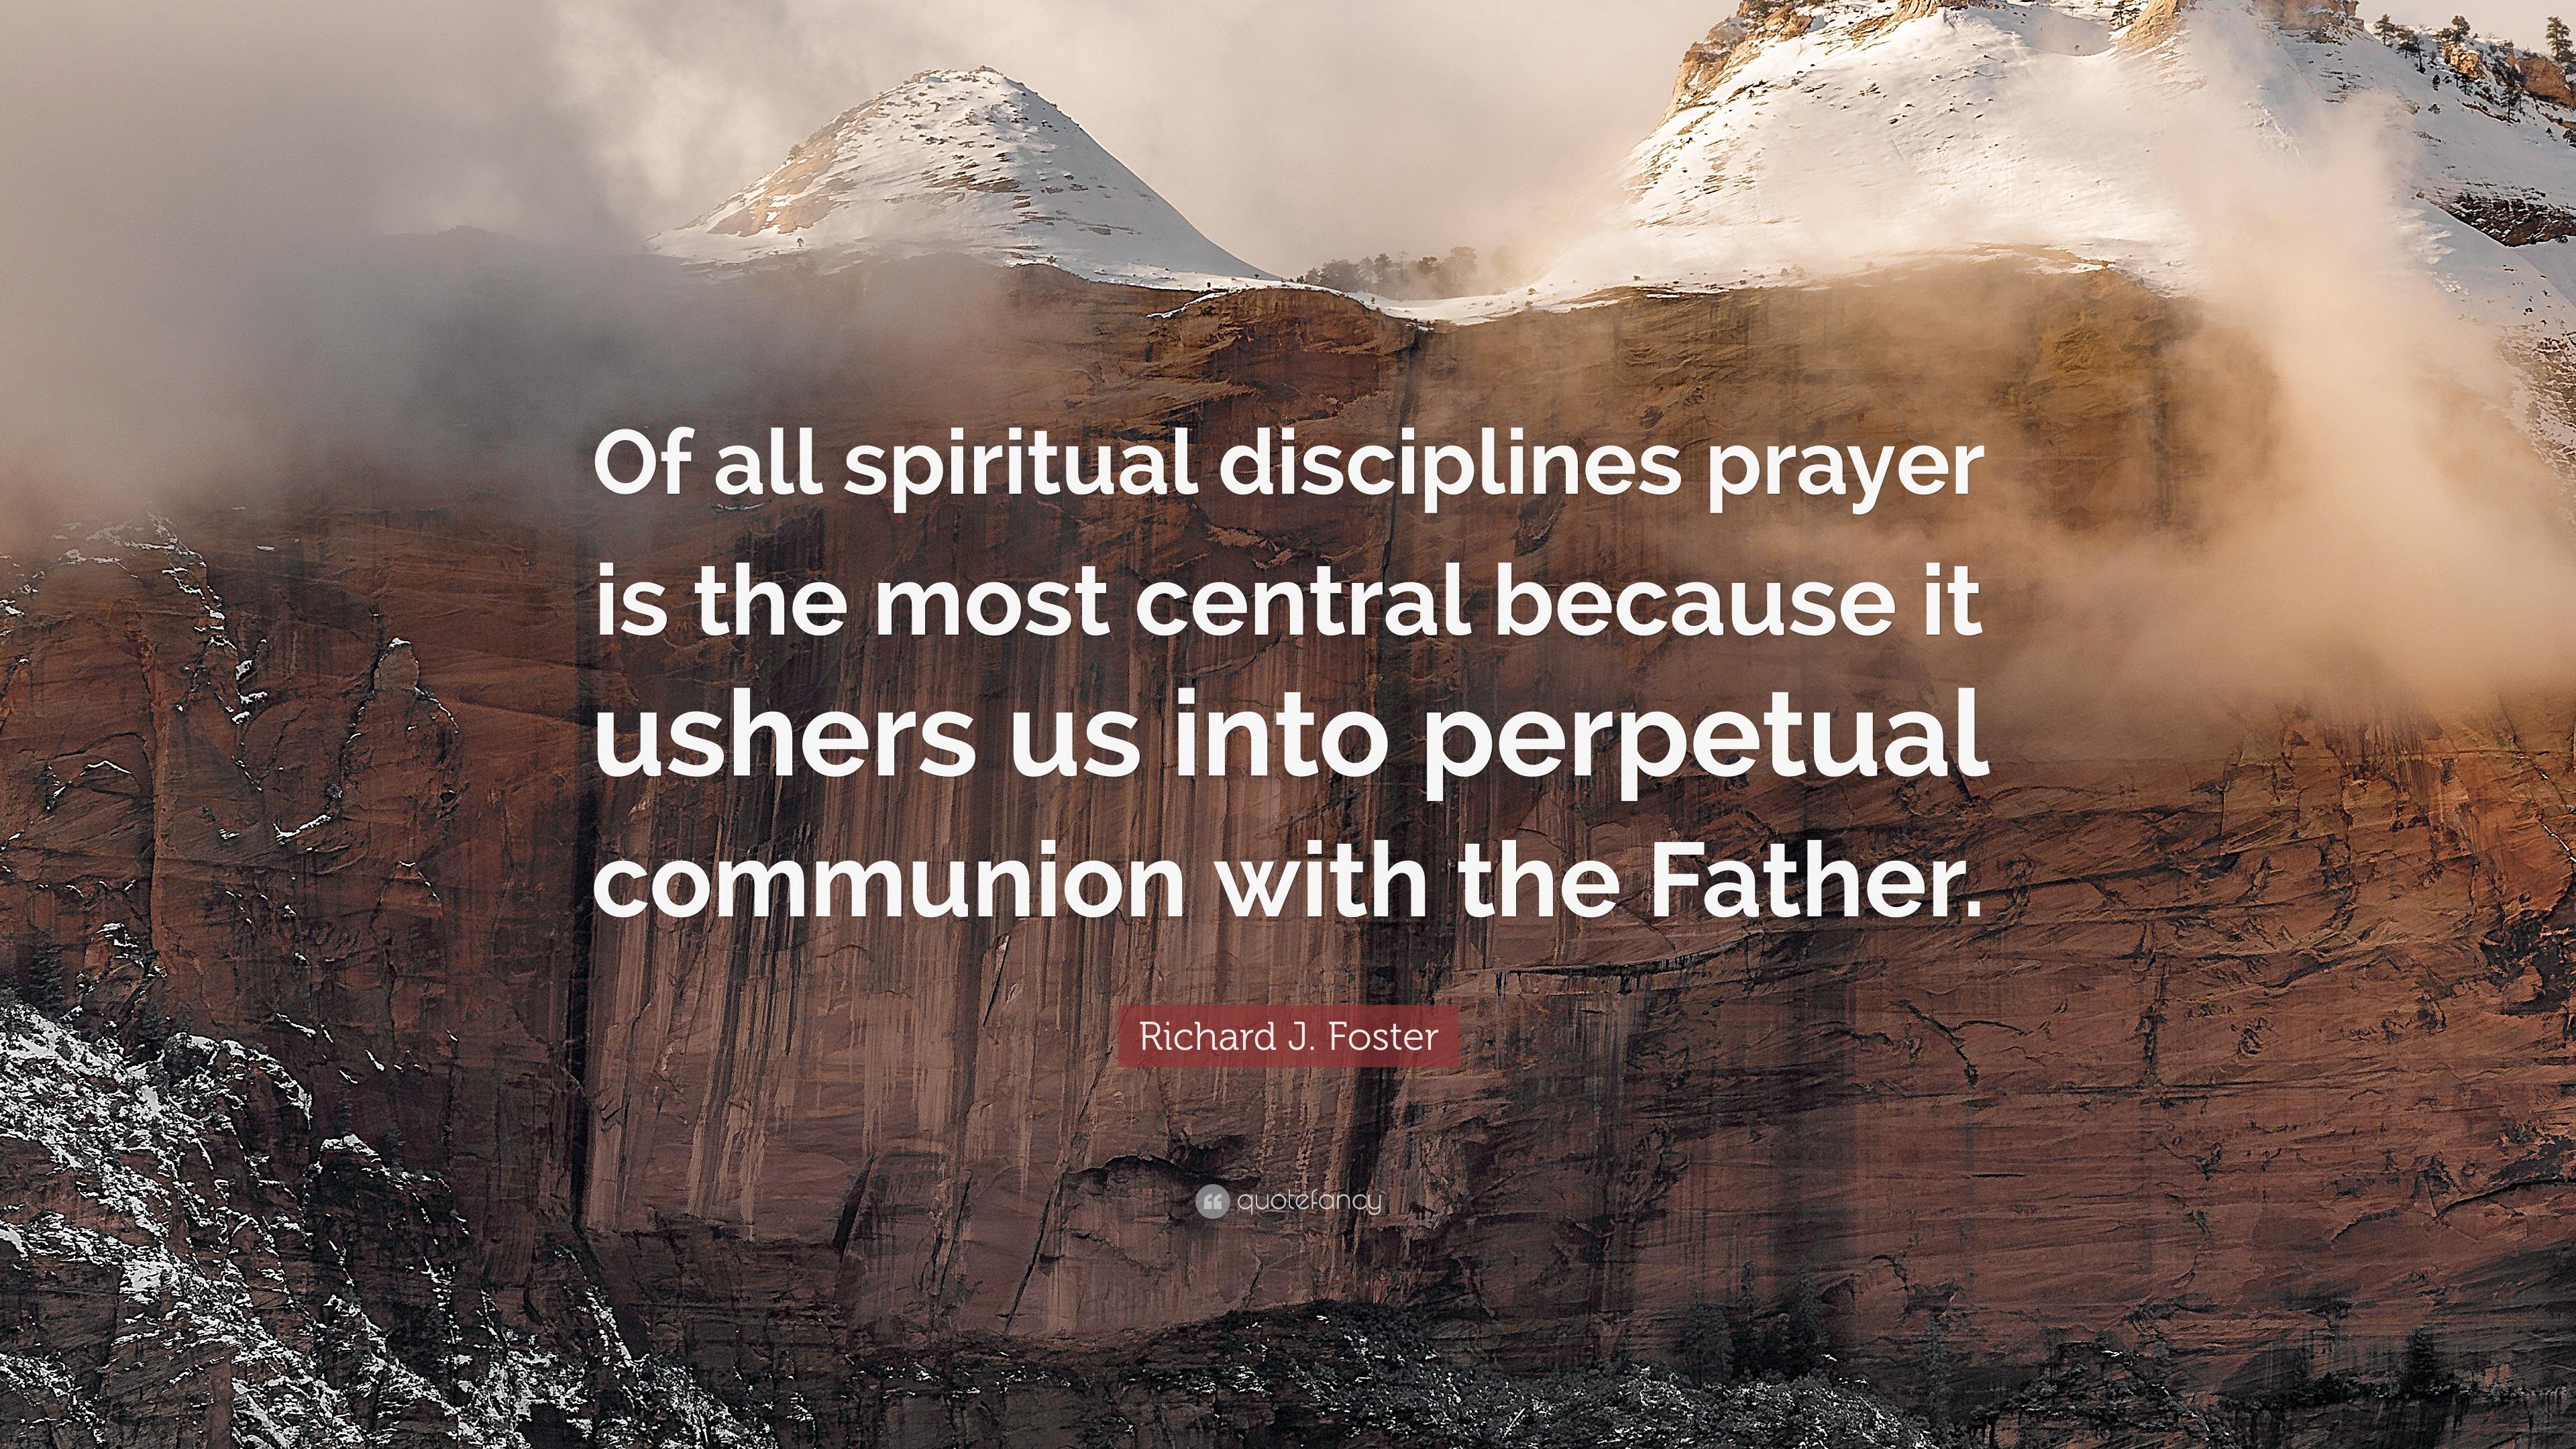 Richard Foster and Contemplative Prayer